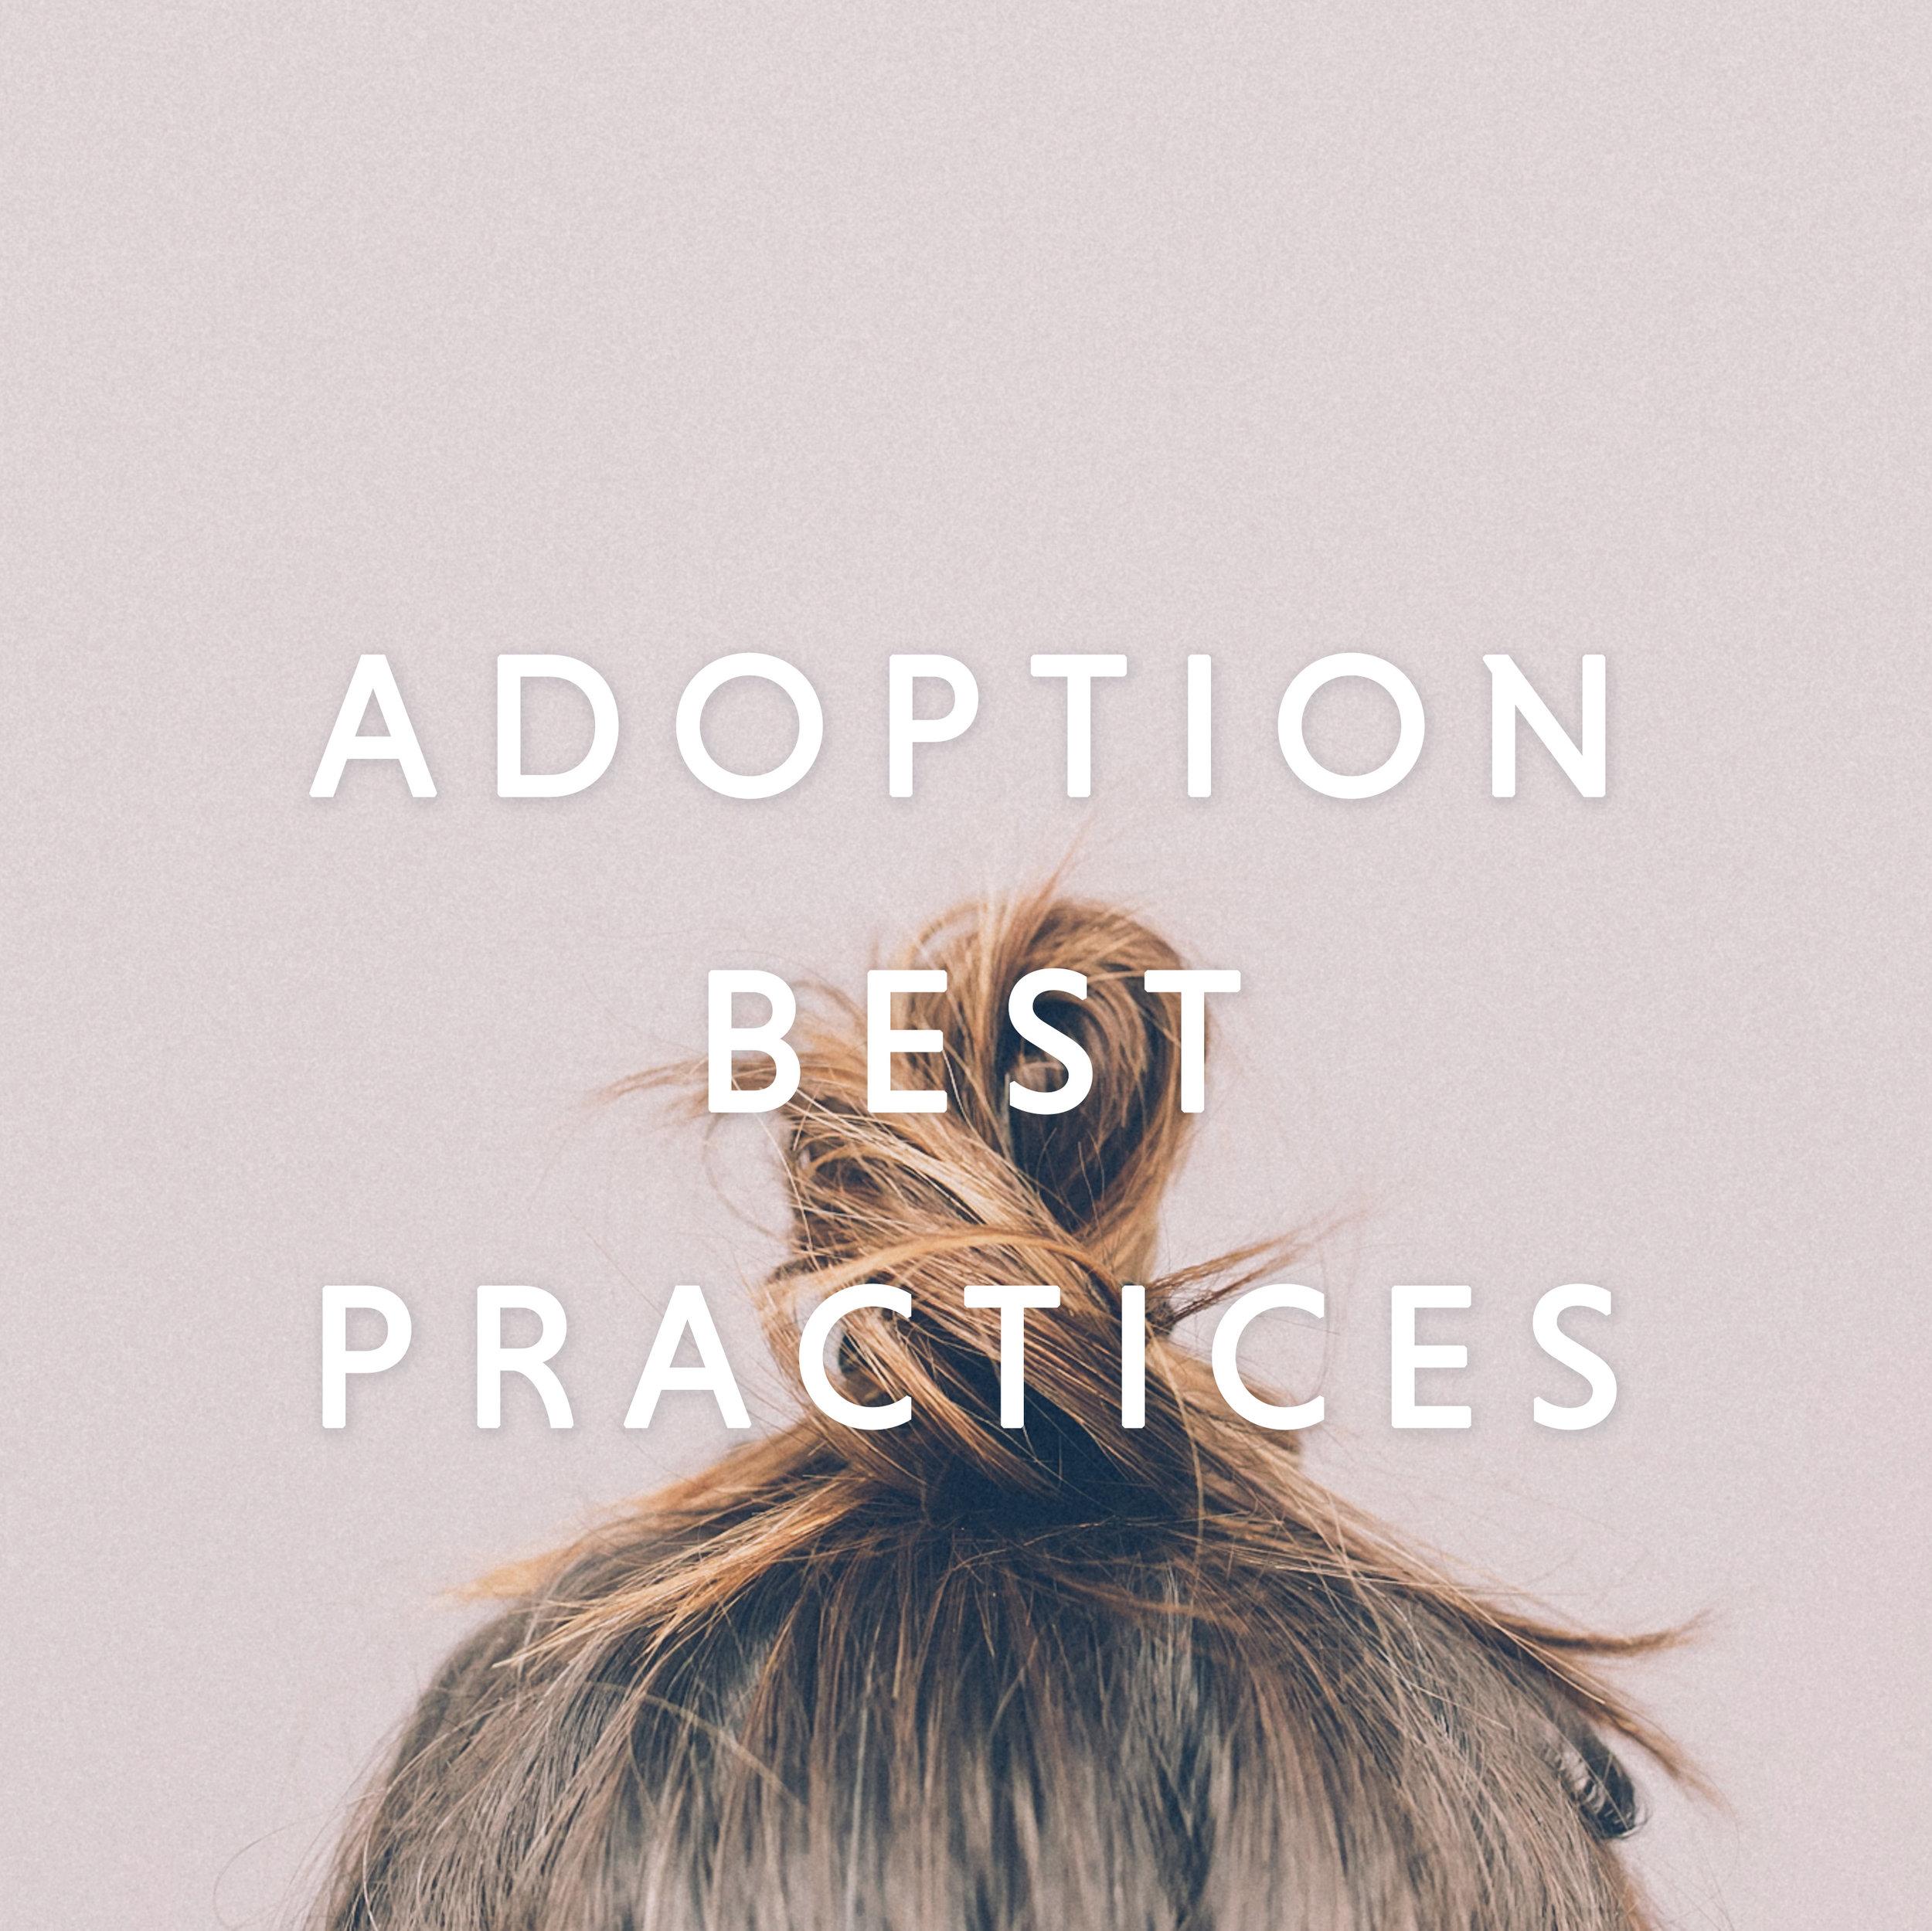 best practices in adoption-social.jpg